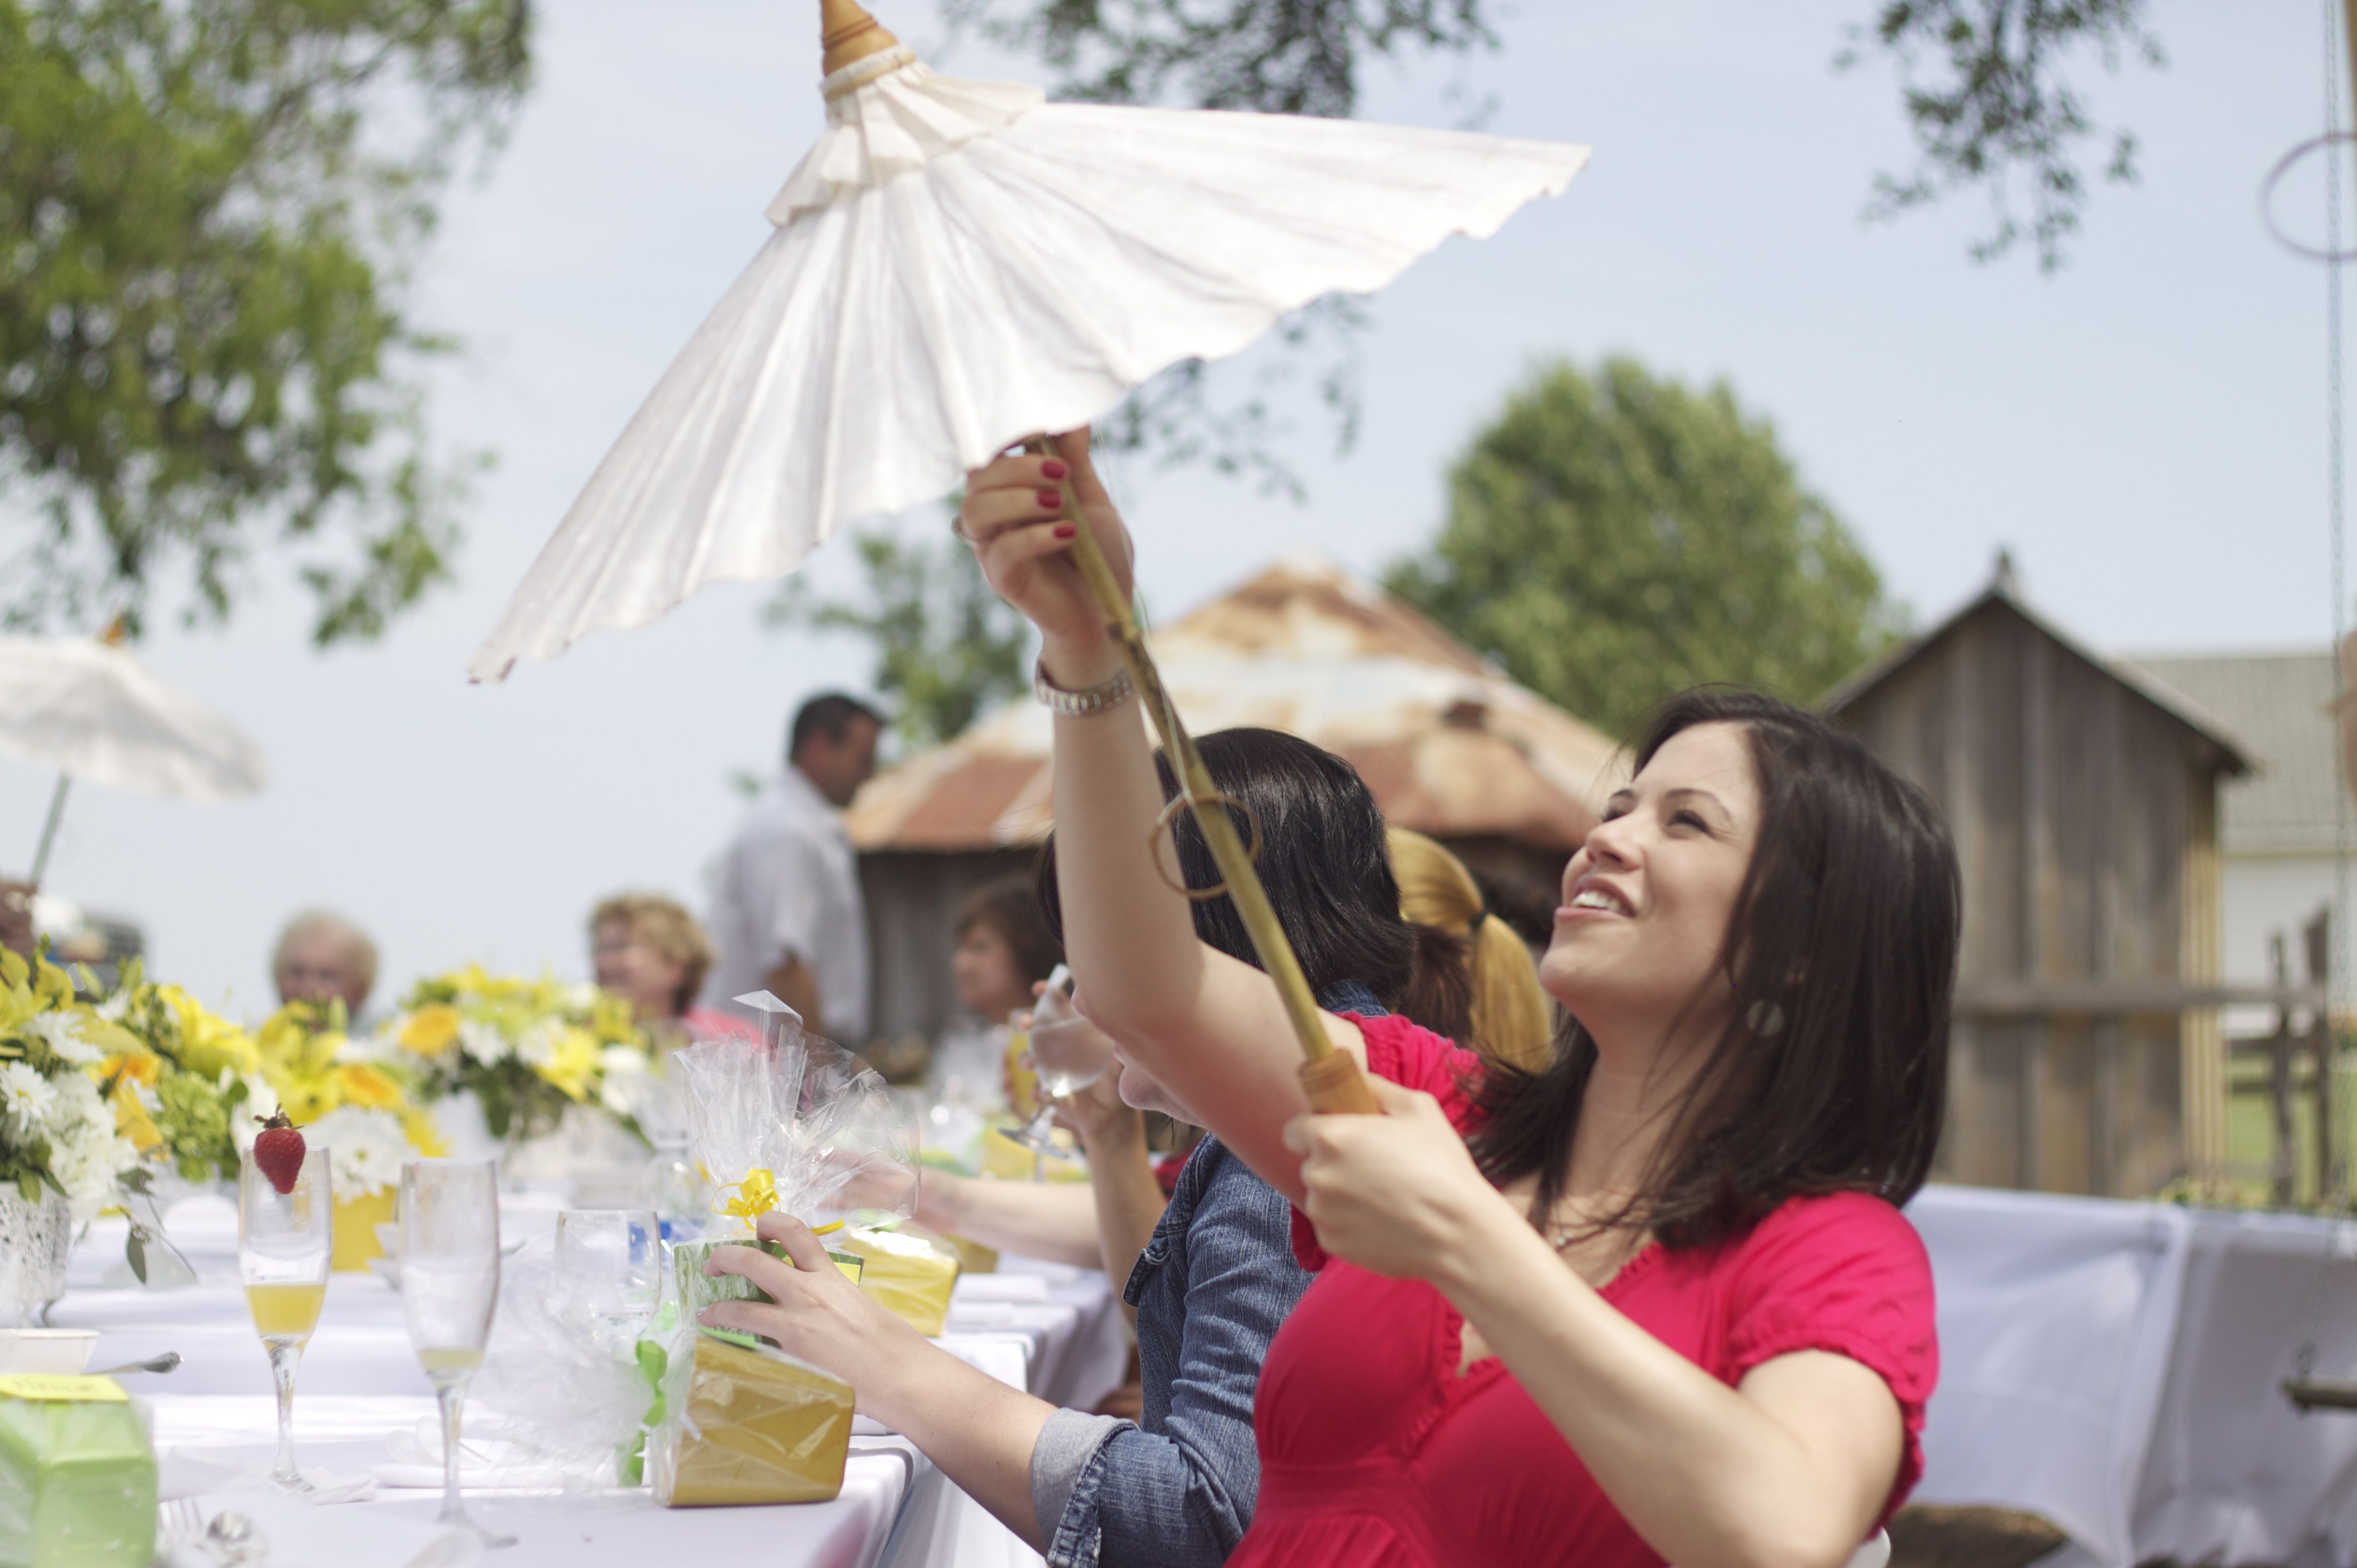 The parasols were adorable!